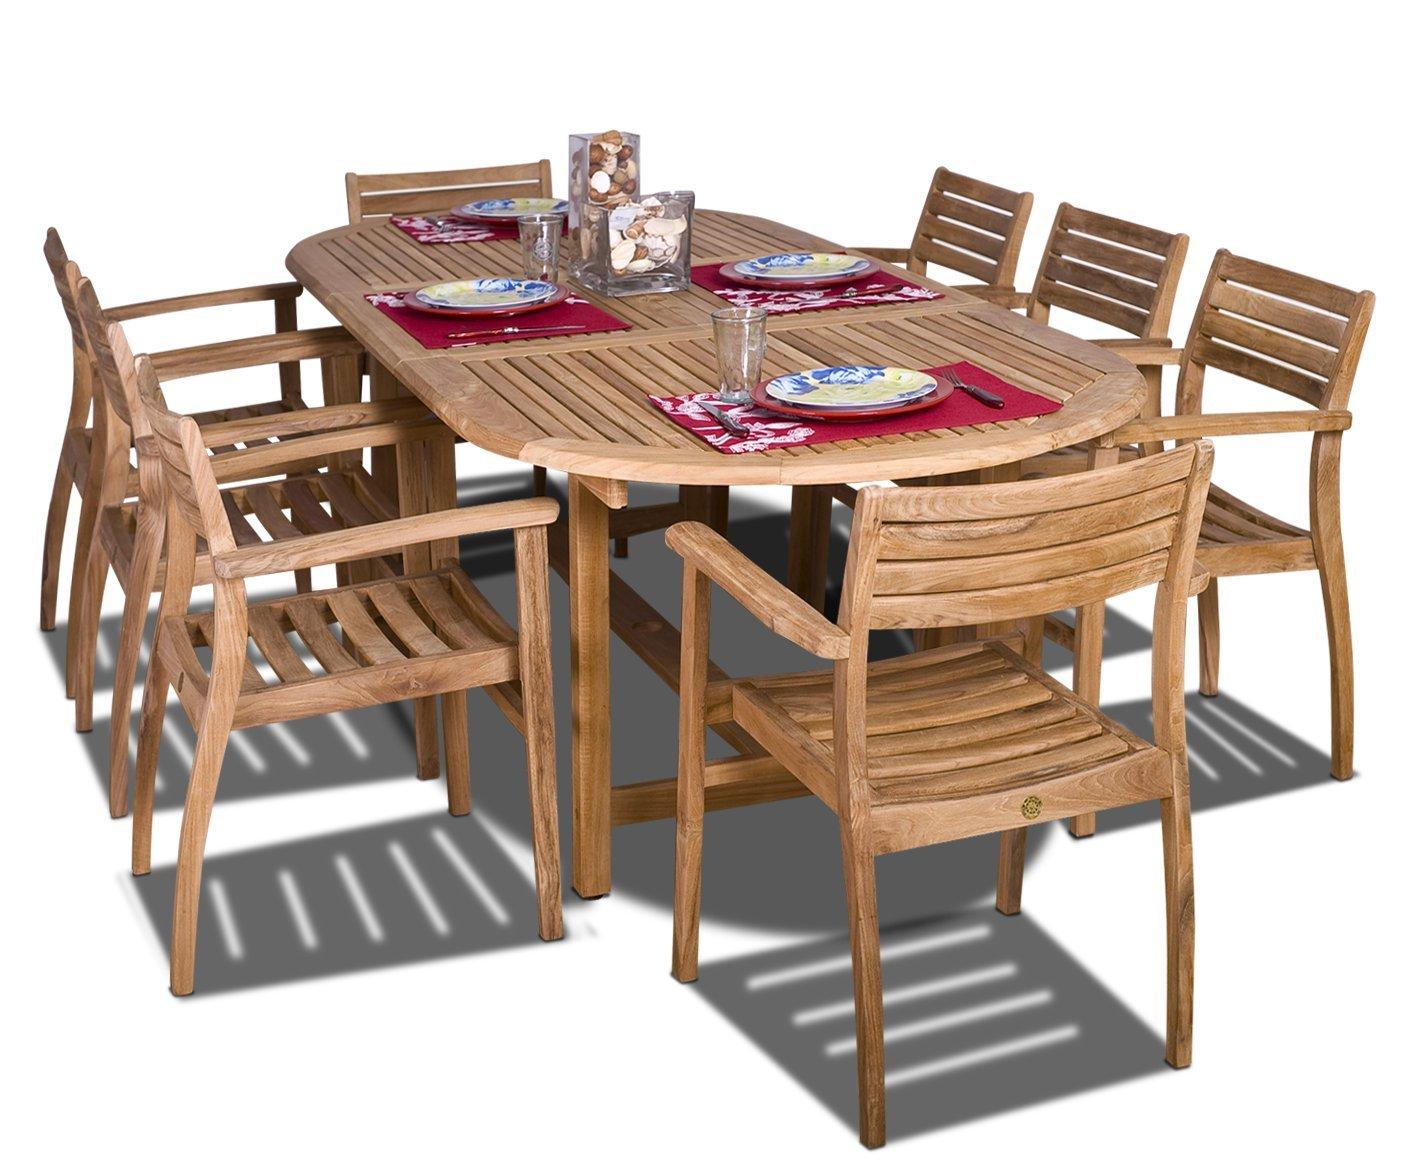 Amazoncom Amazonia Teak Coventry 9Piece Teak Oval Dining Set